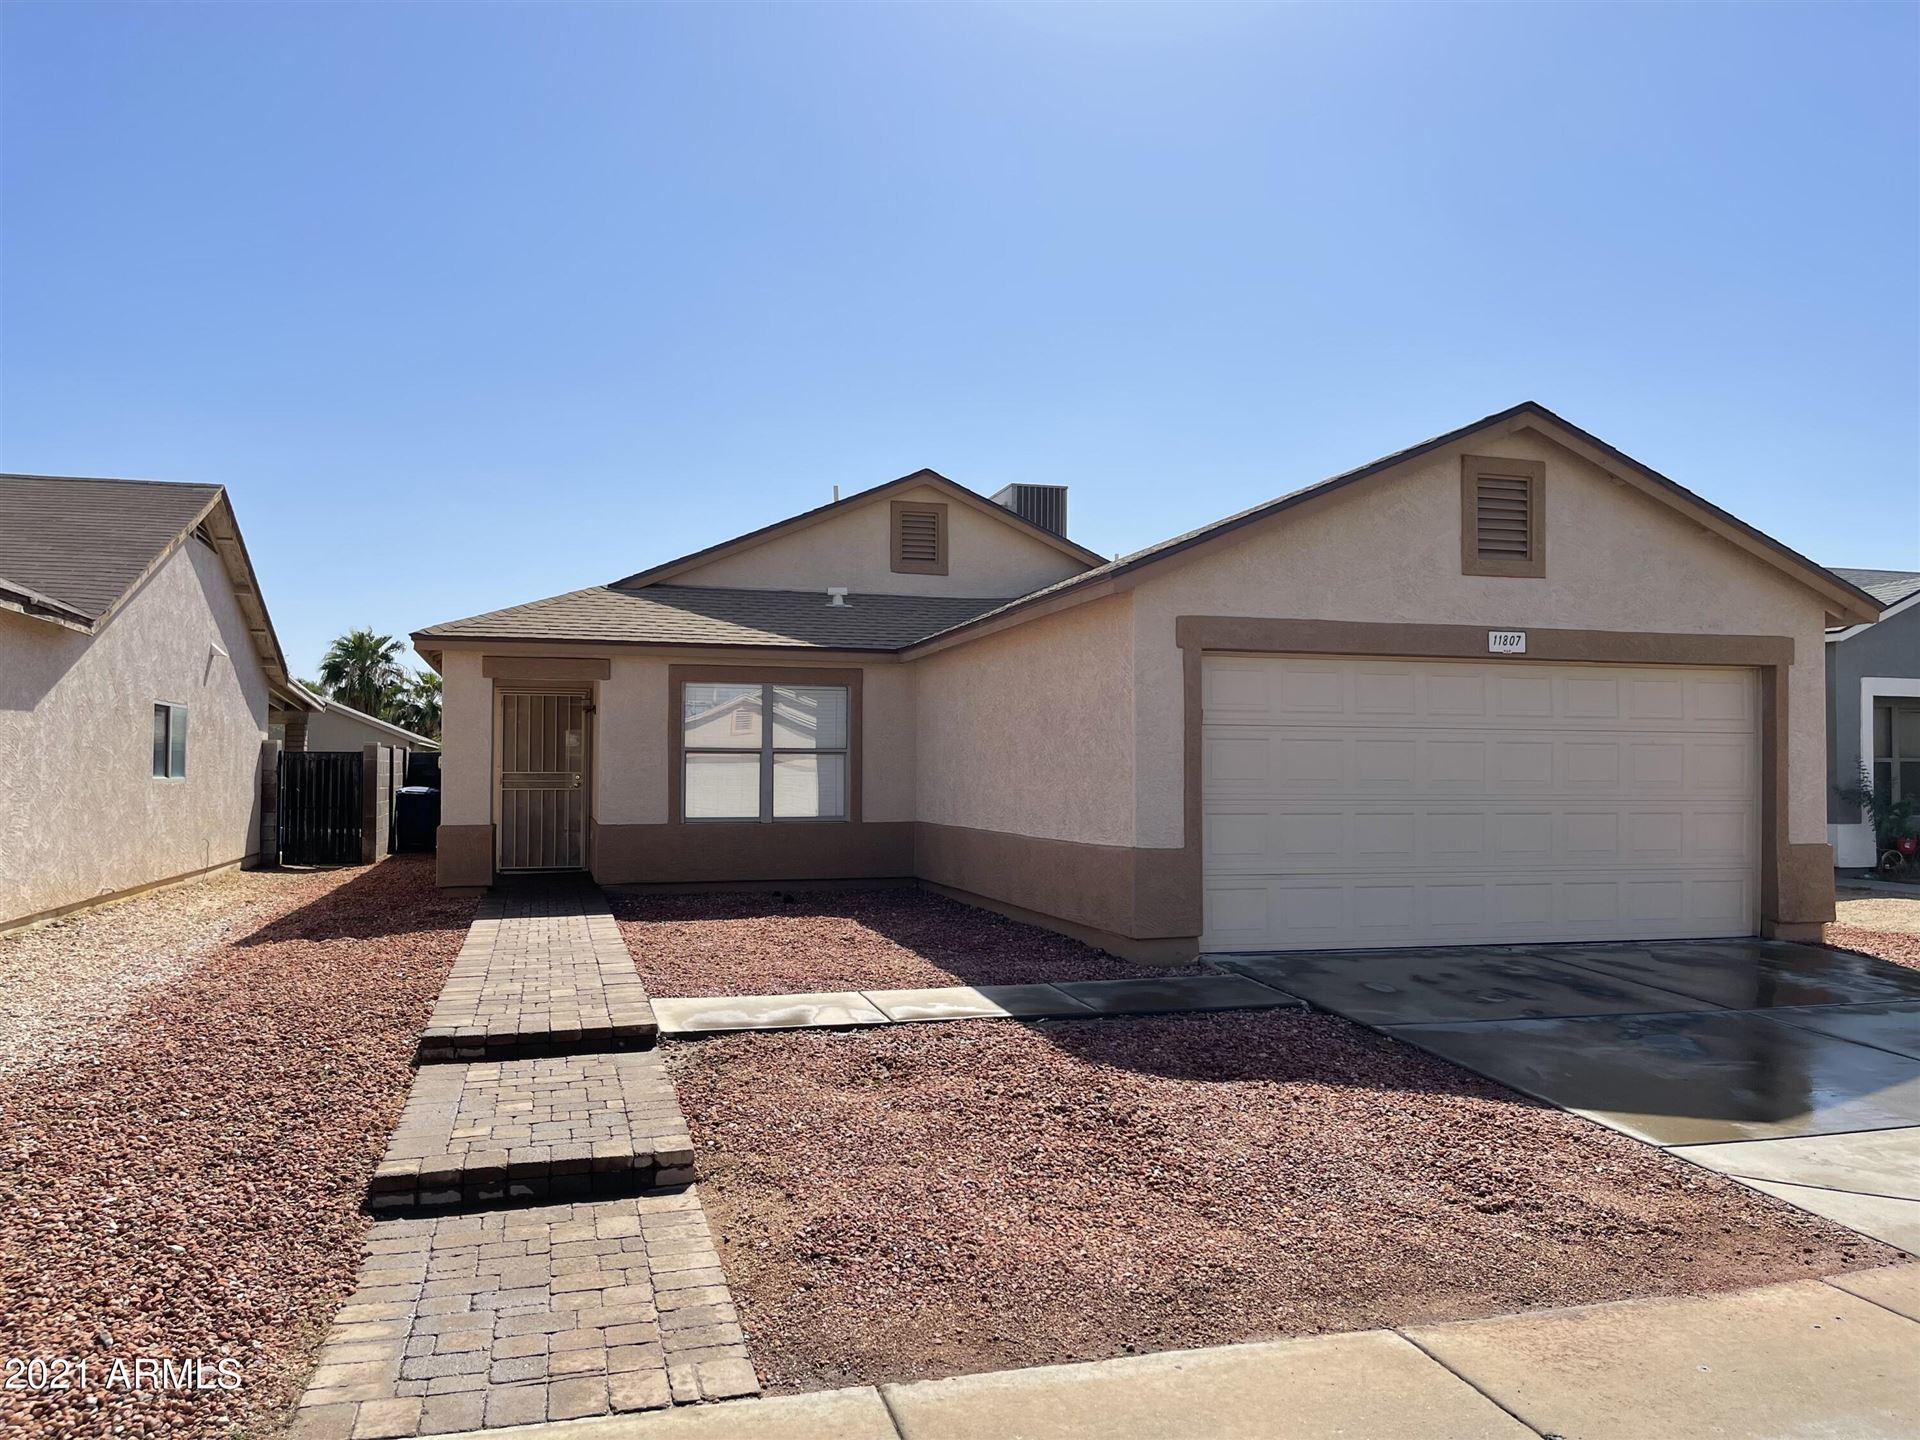 Photo of 11807 W COLUMBINE Drive, El Mirage, AZ 85335 (MLS # 6306386)